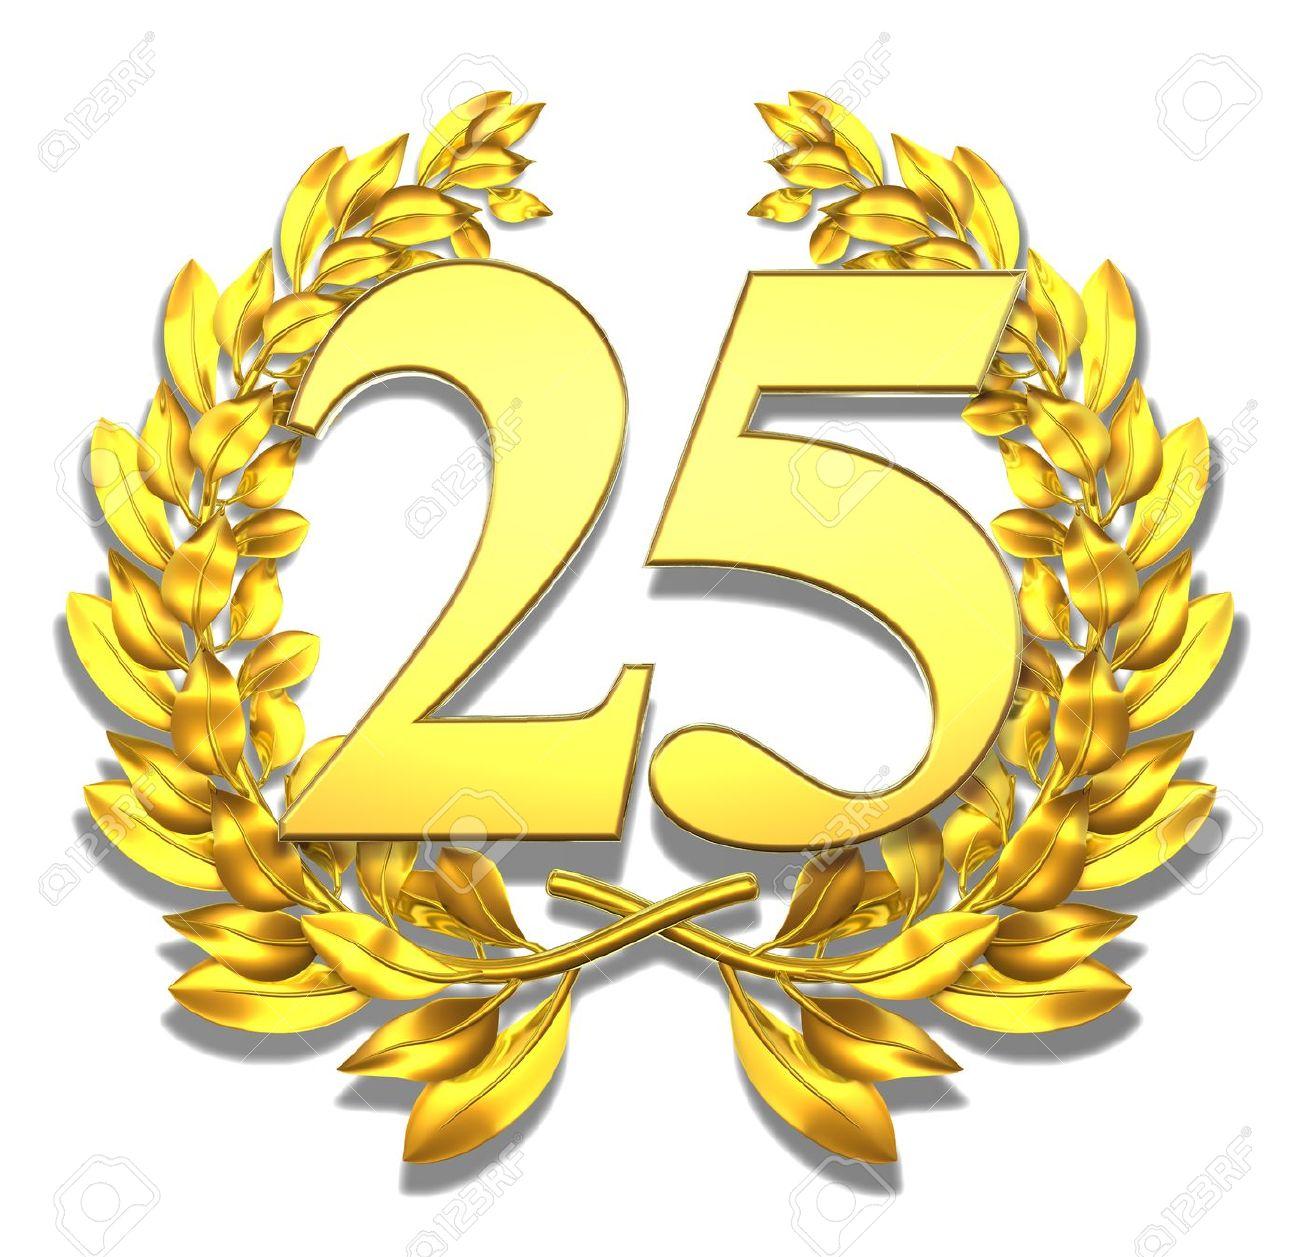 Number Twenty.